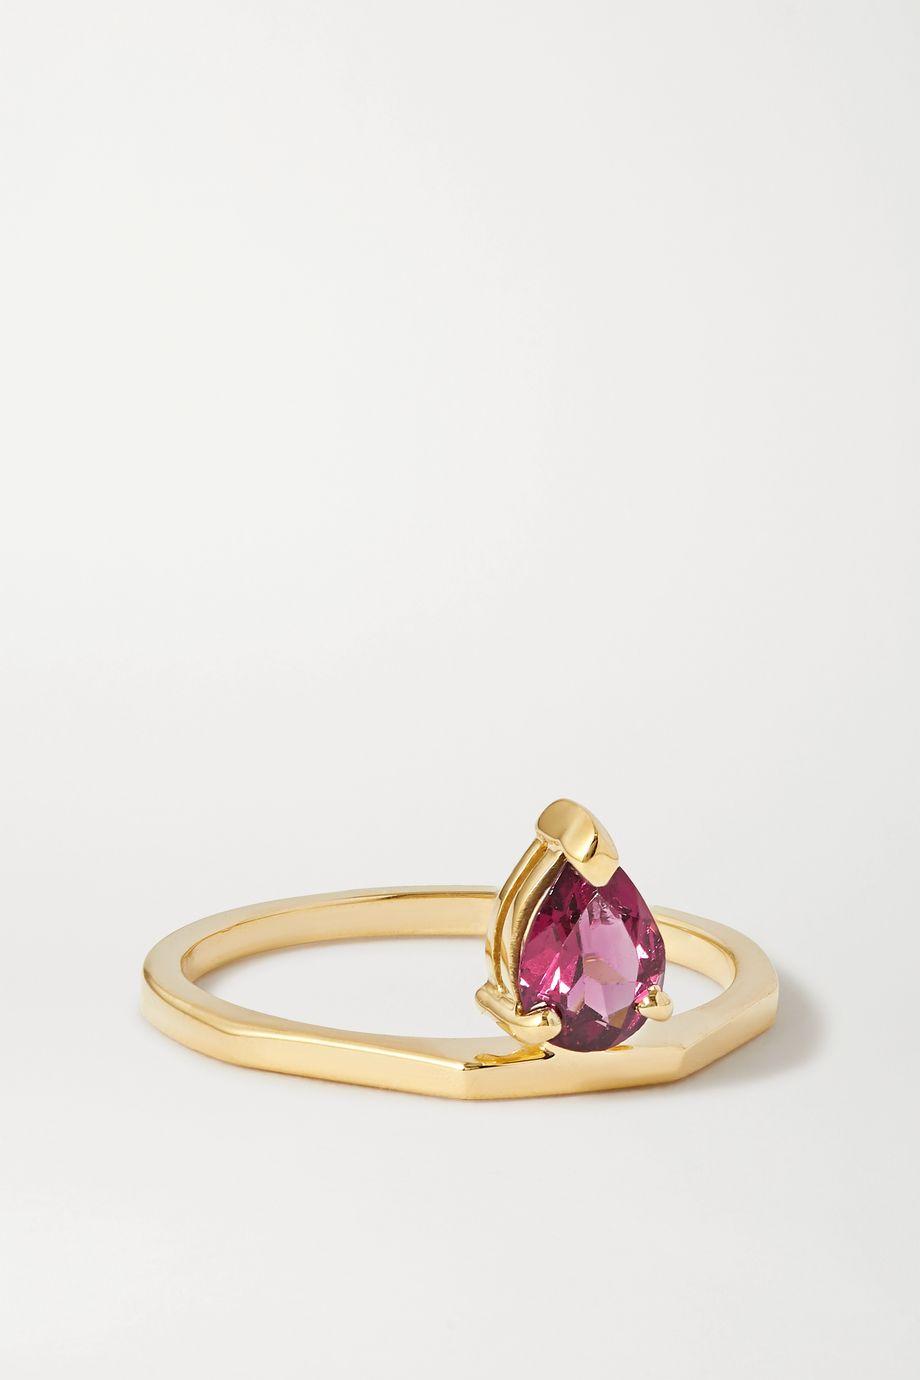 Natasha Schweitzer El 9-karat gold garnet ring